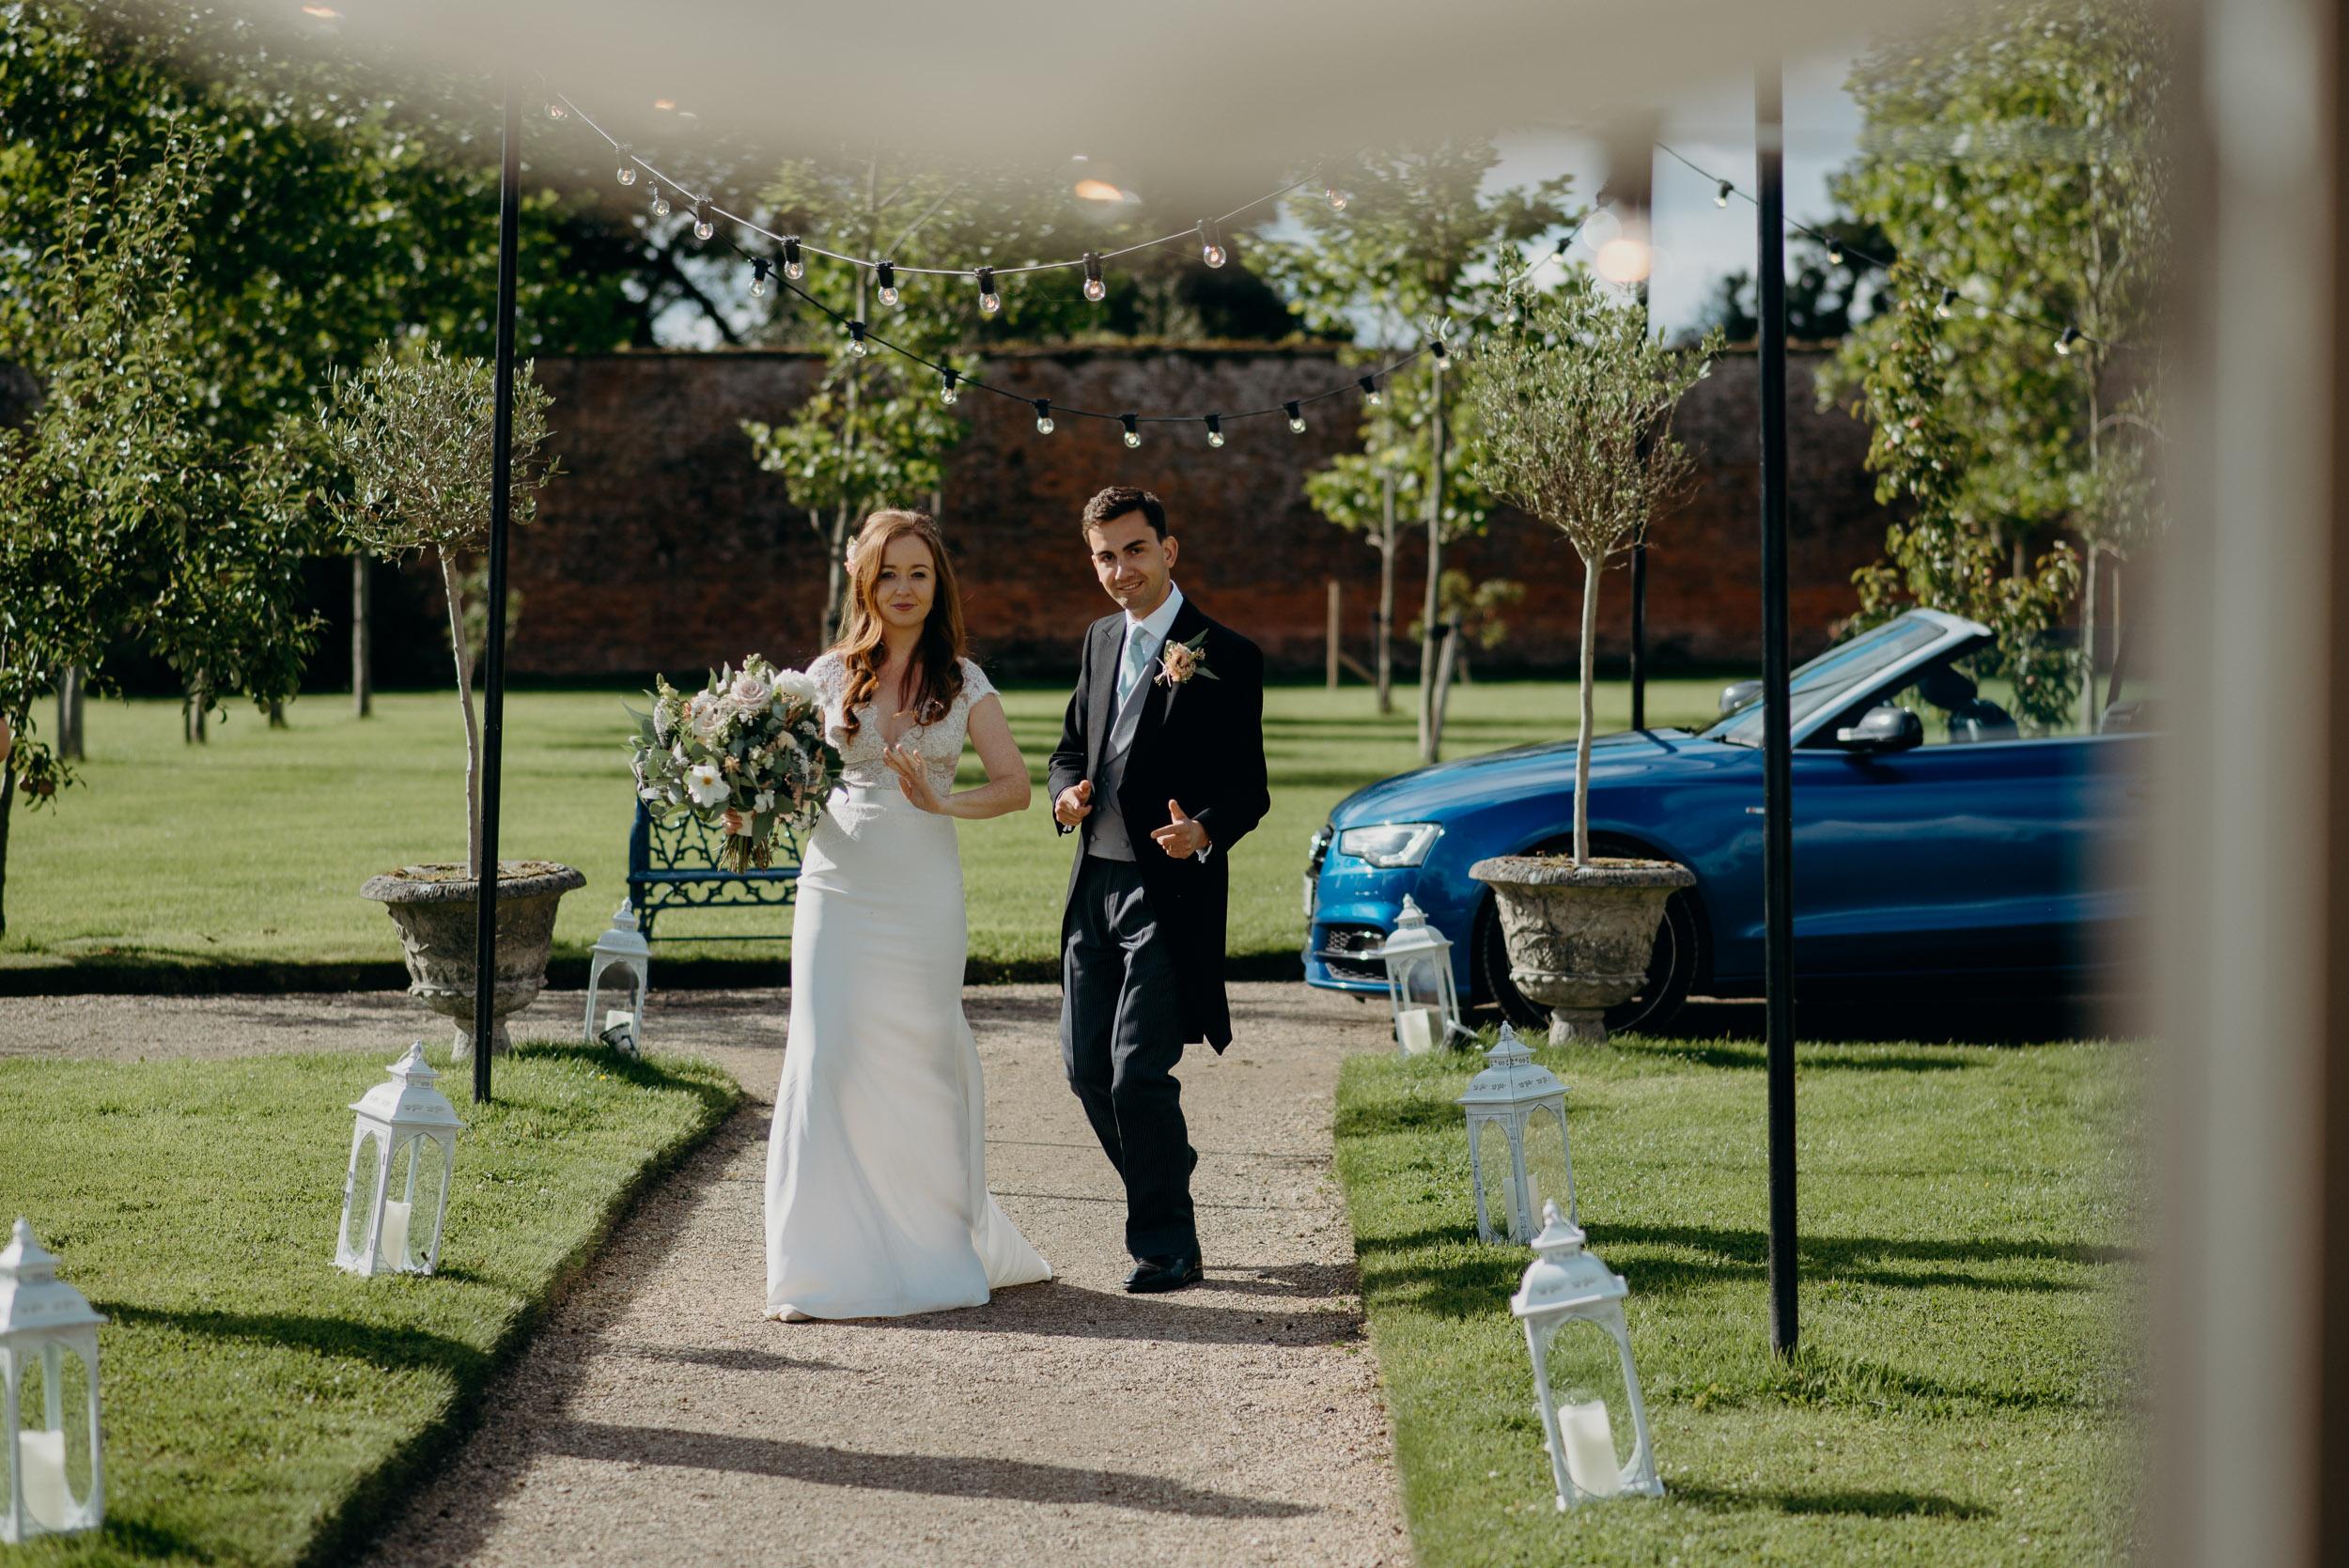 drenagh estate wedding photography-102.jpg